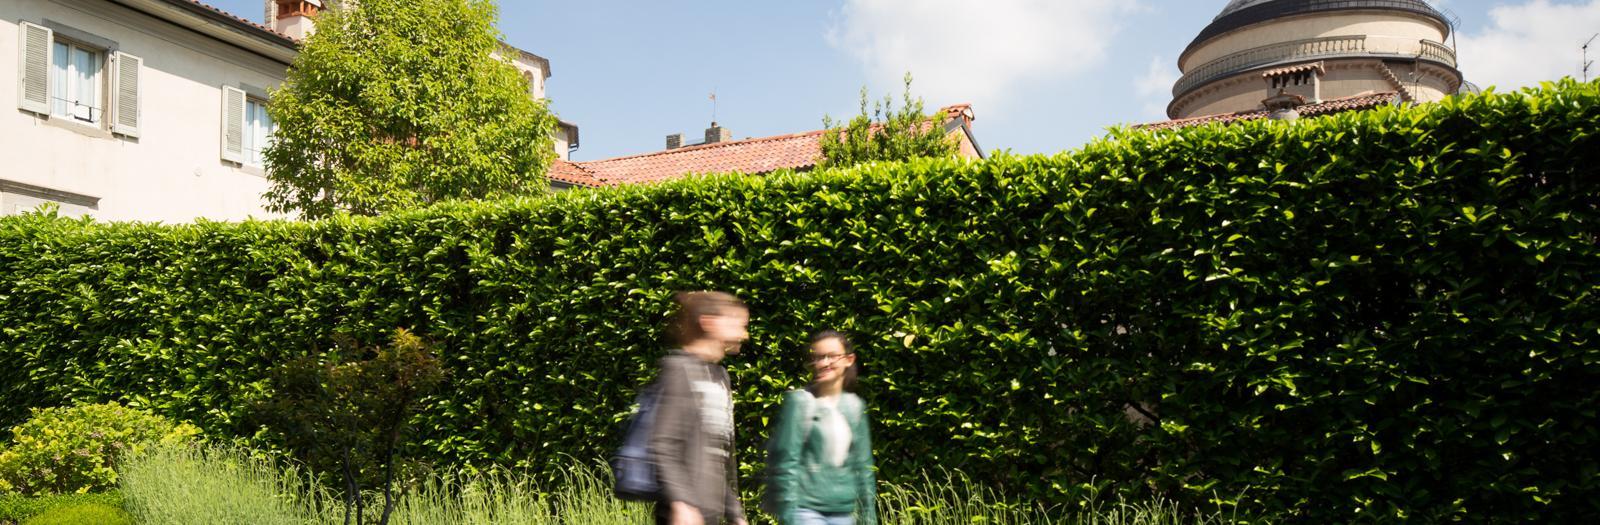 Studentesse nel giardino di Rosate